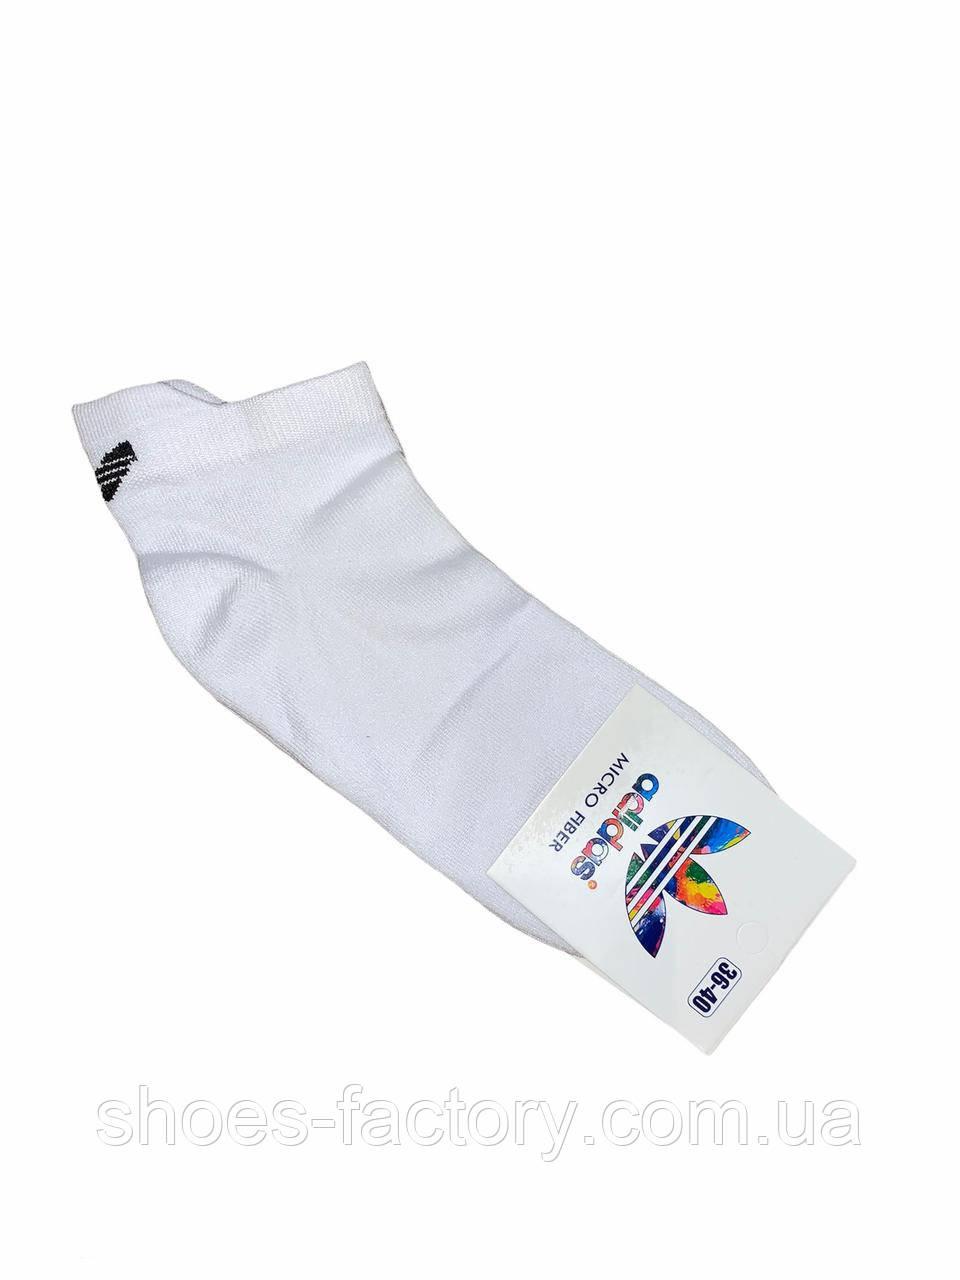 Женские носки Adidas, White/Белые